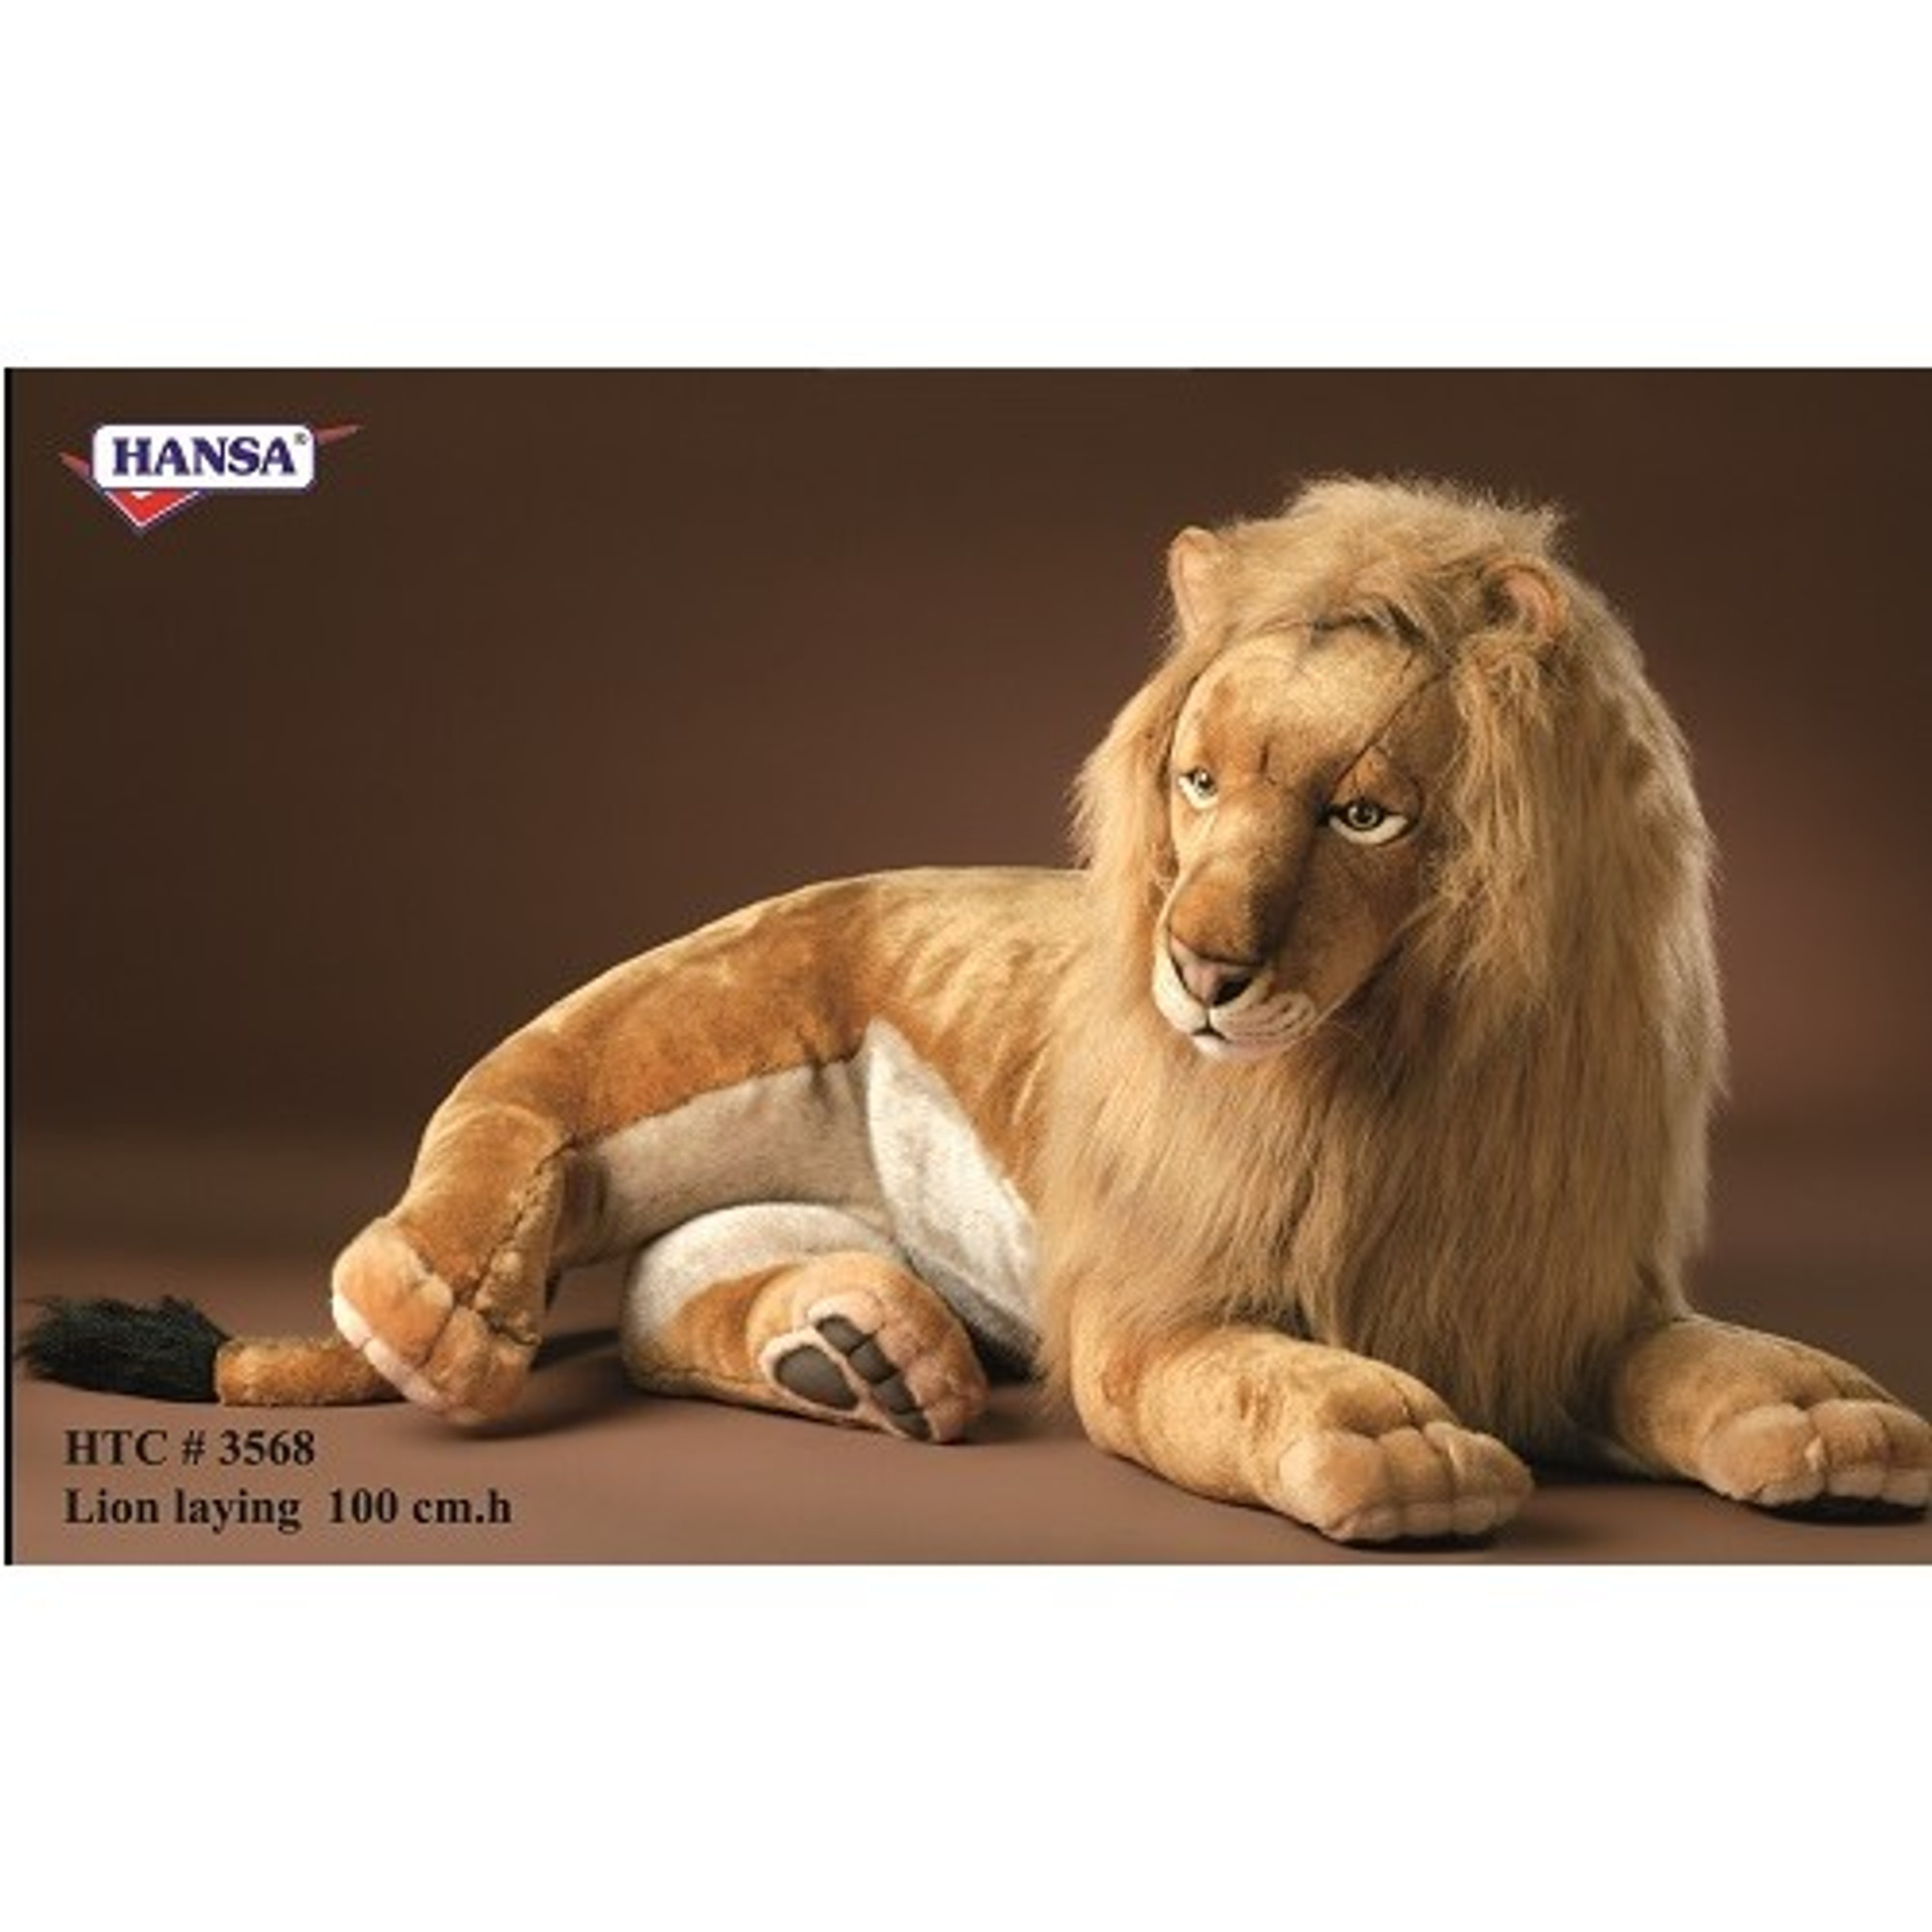 Lion Extra Large Stuffed Animal Male Lion Plush Hansa Toys